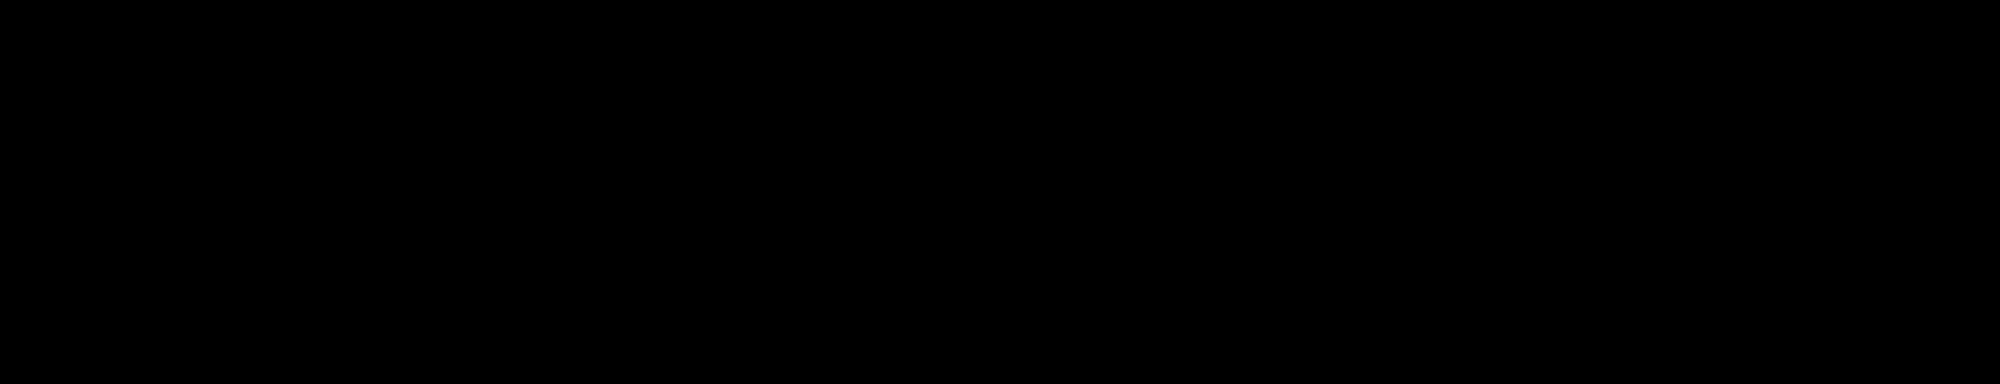 File:Steinbach Logo.svg.